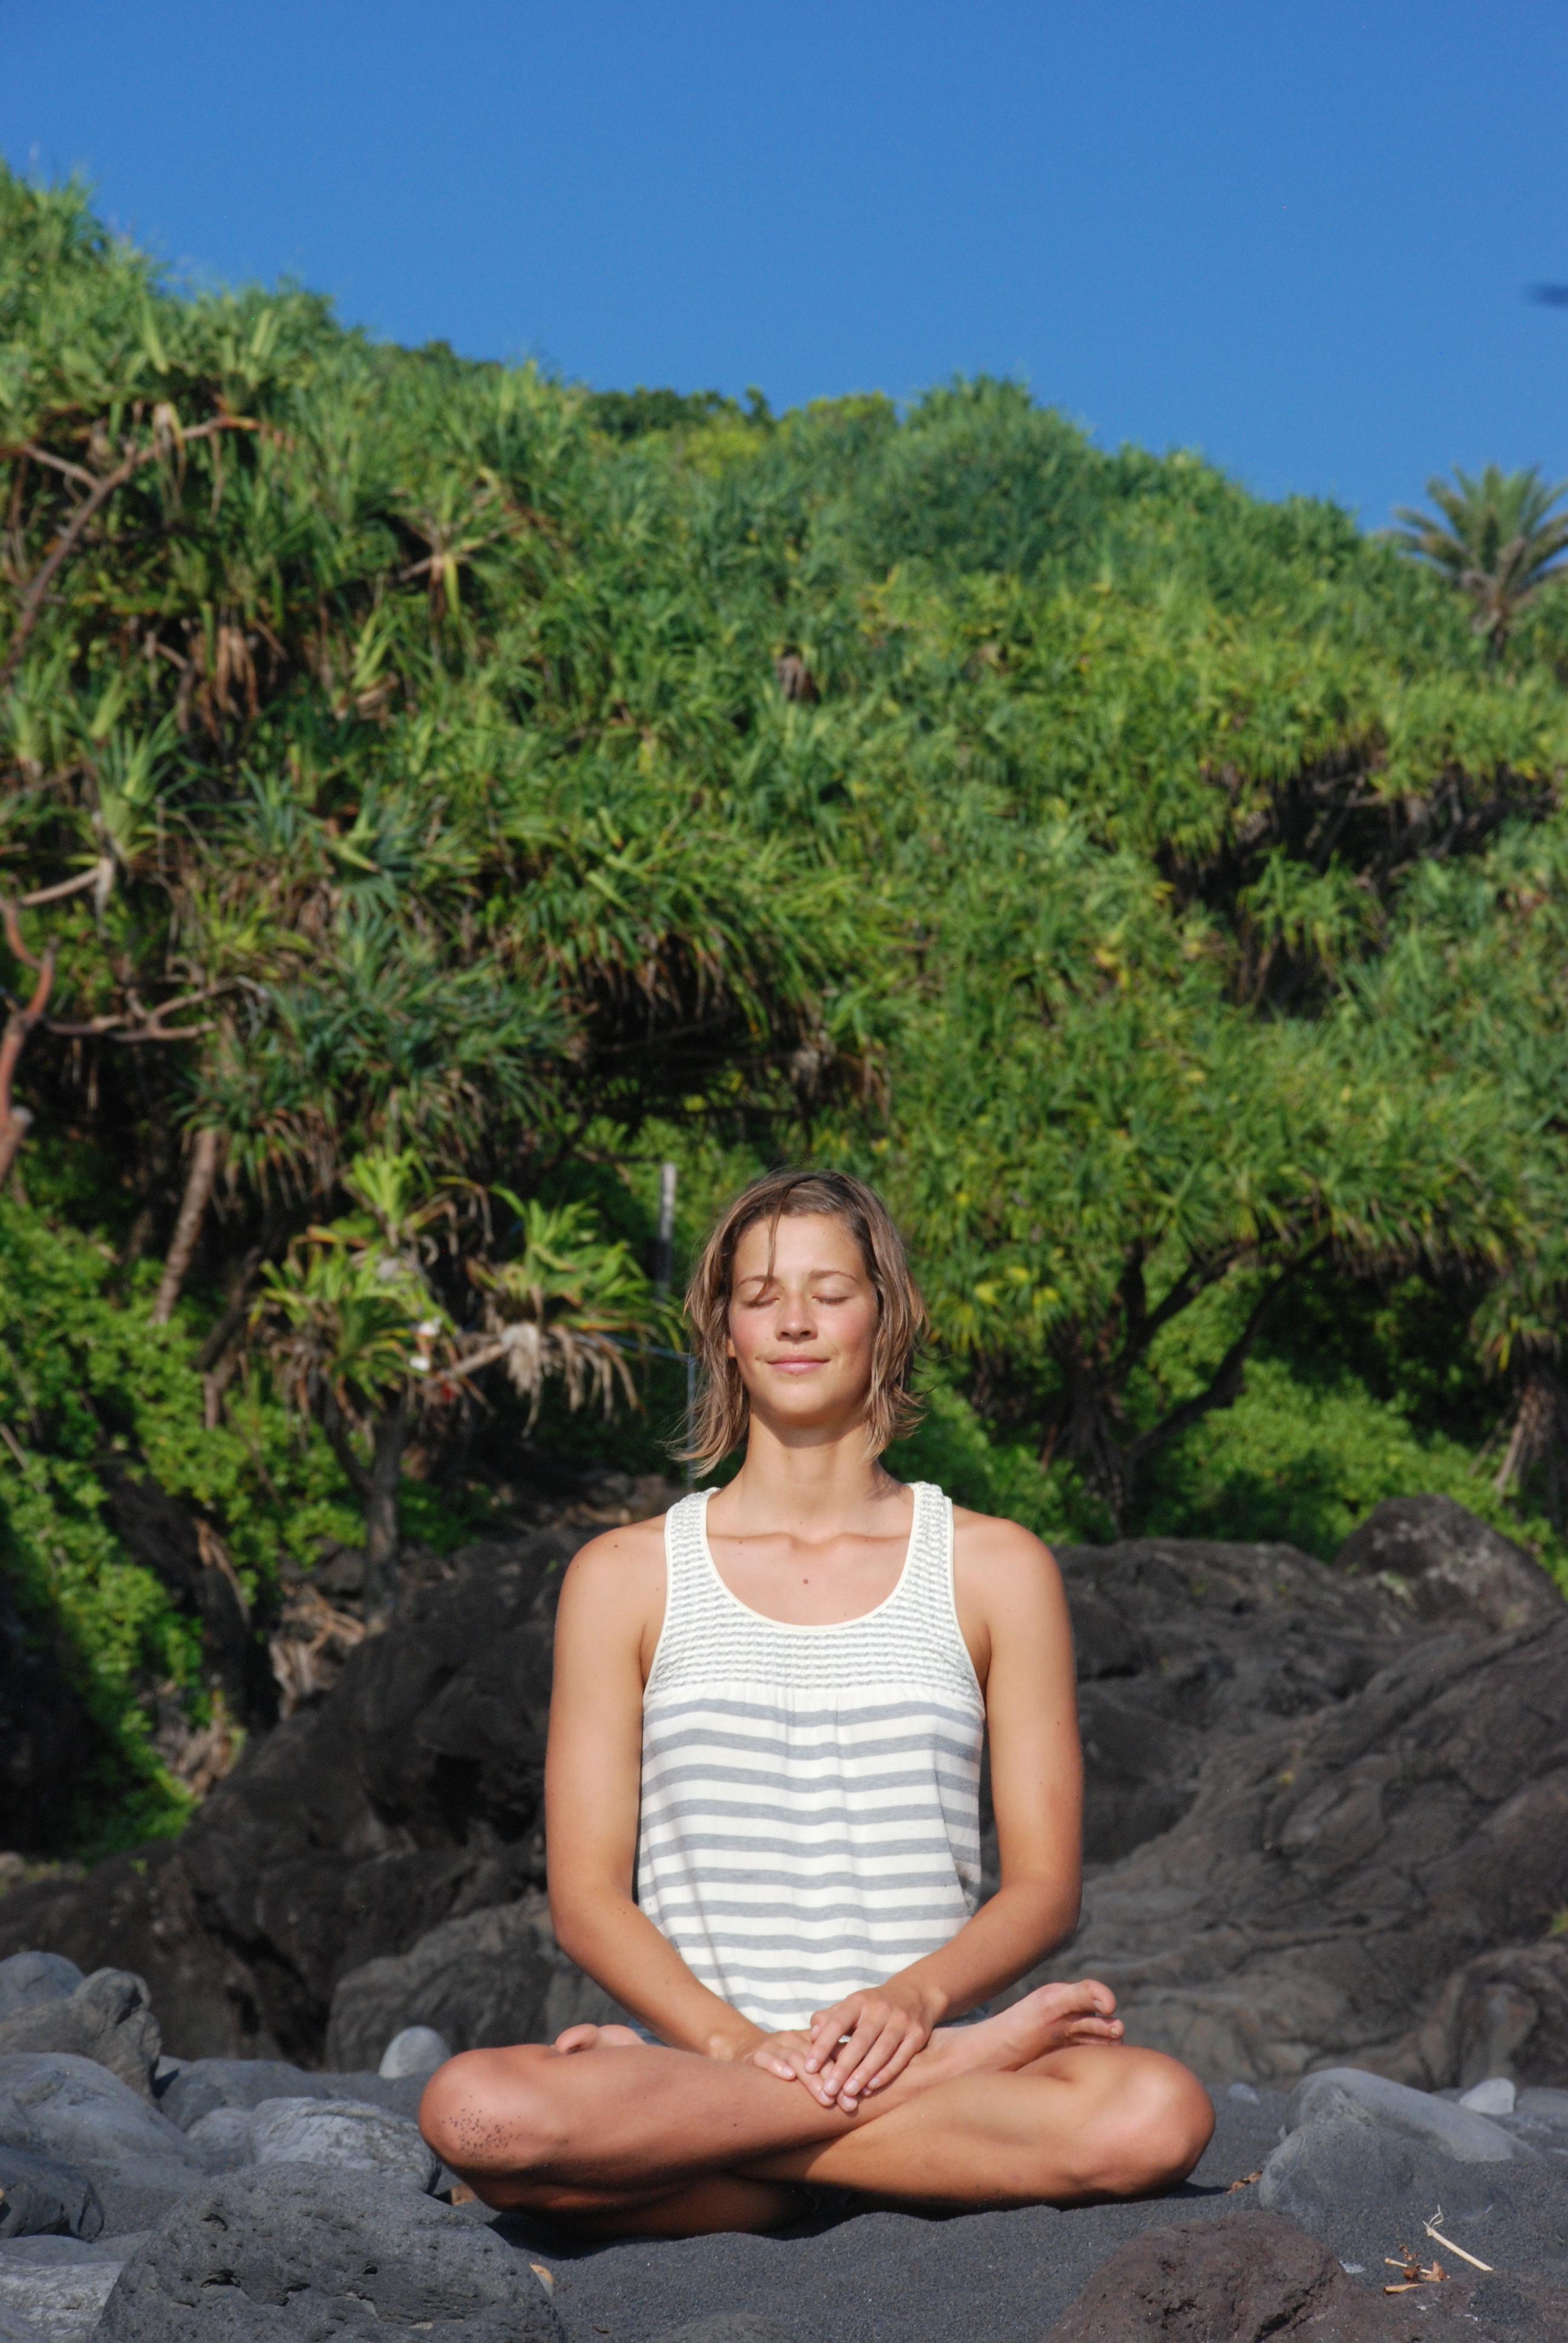 Practicing Mindfulness Through Rain